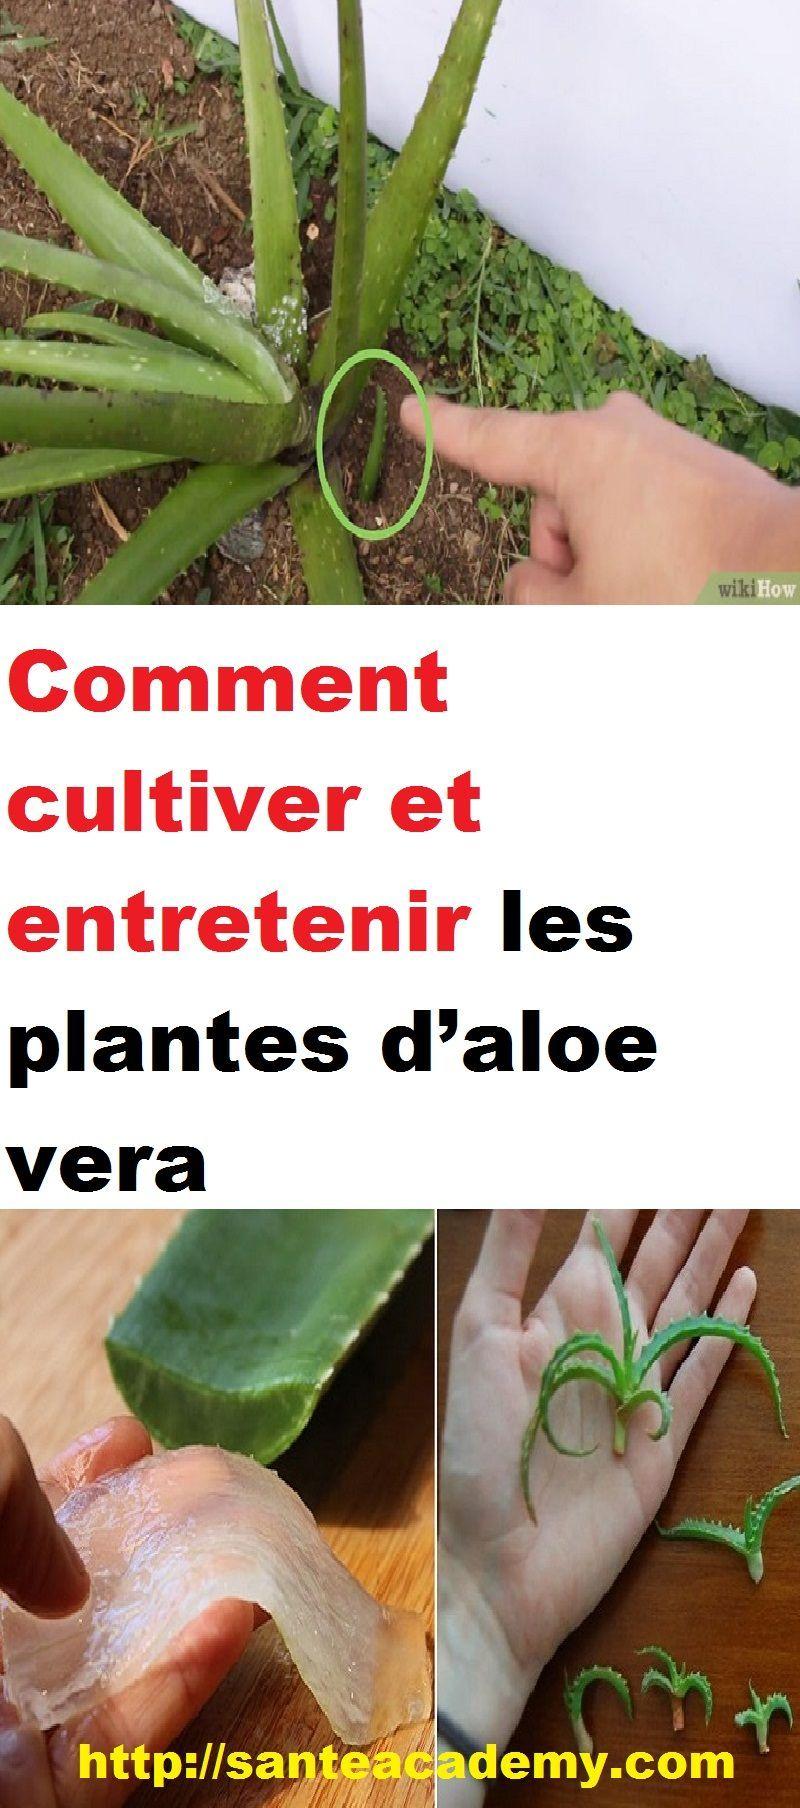 Comment Entretenir Une Plante Aloe Vera comment cultiver et entretenir les plantes d'aloe vera